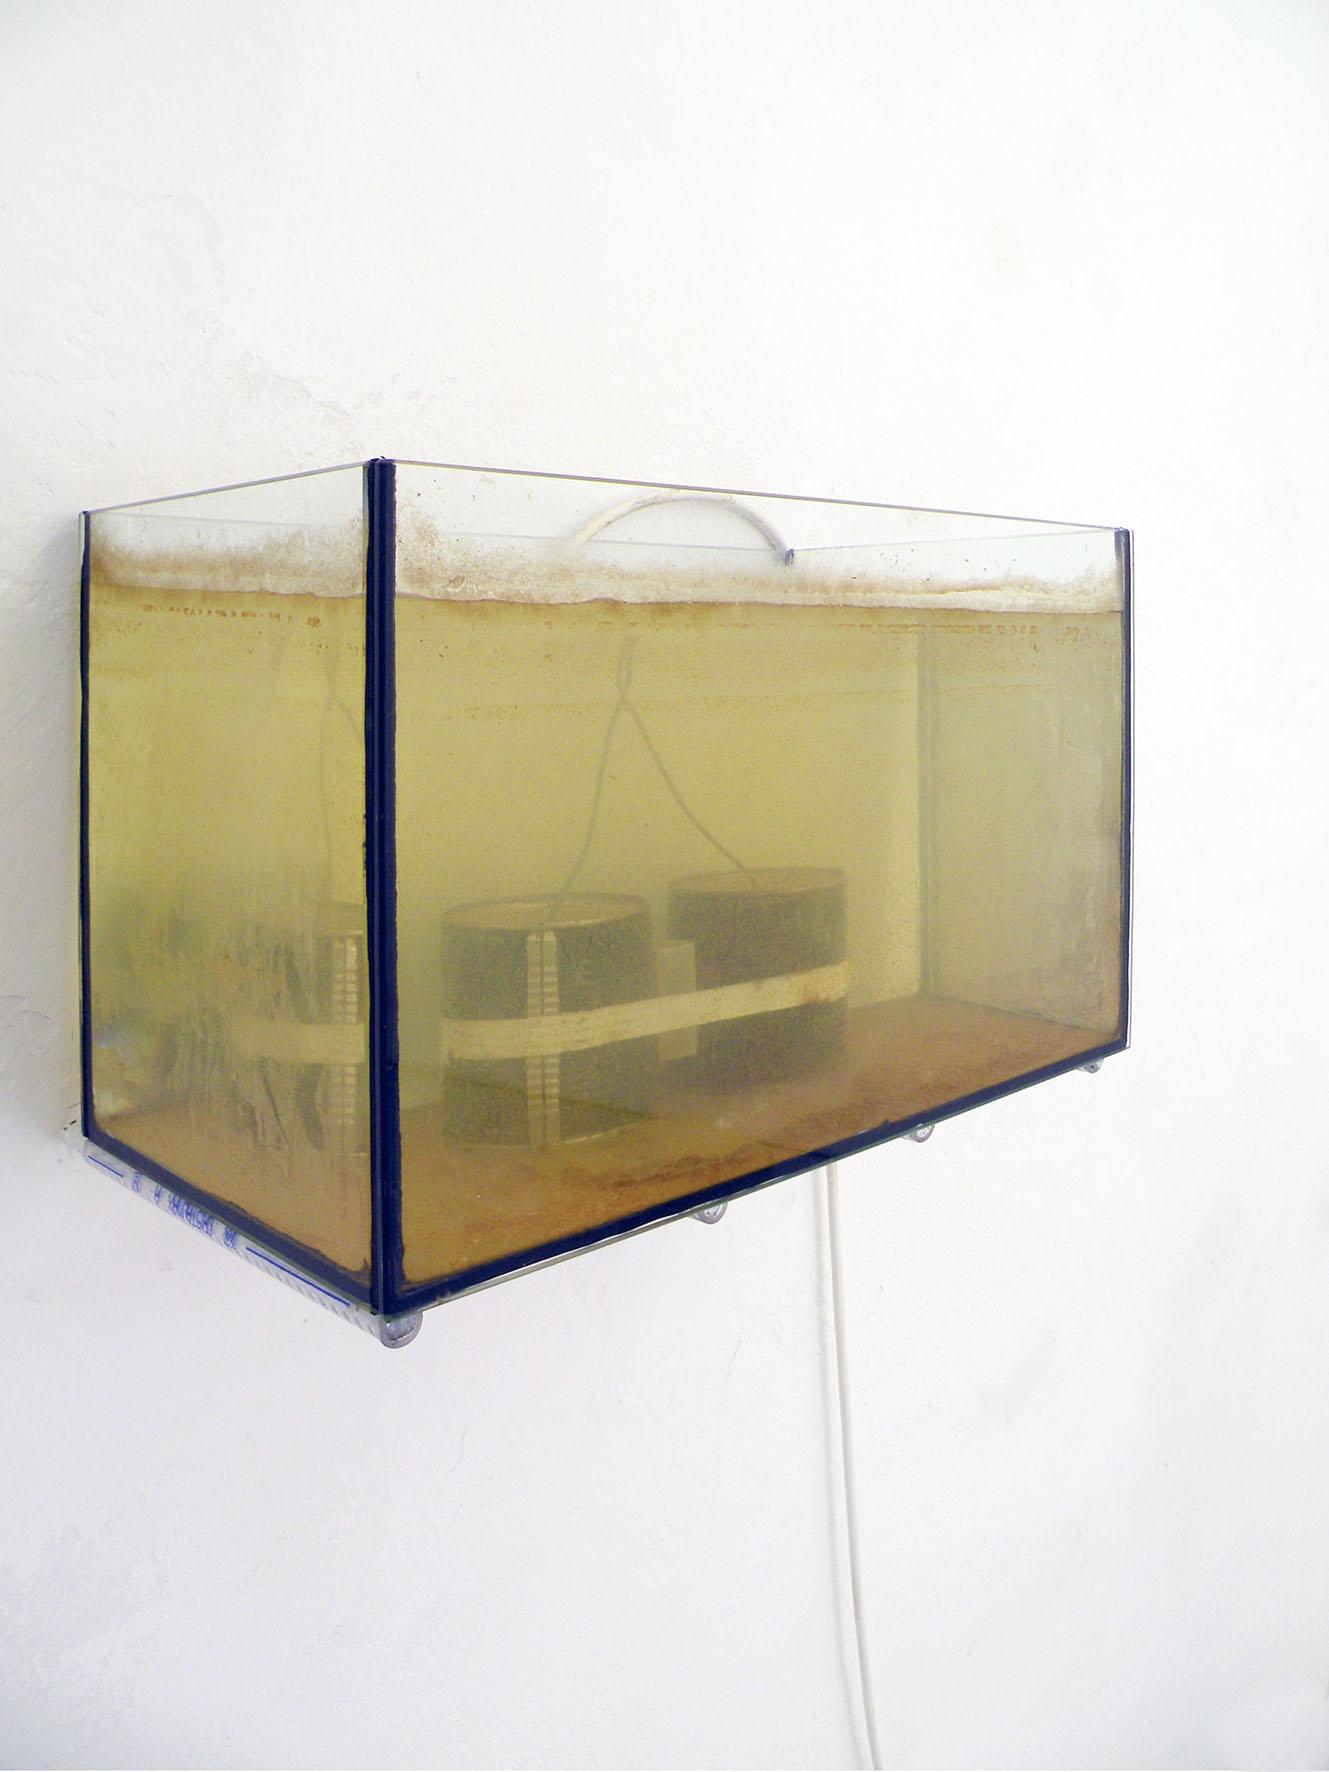 Elia Gobbi. Still life, 2015. Bollitore, acquario, acqua,     pigmento, dimensioni variabili, Detail